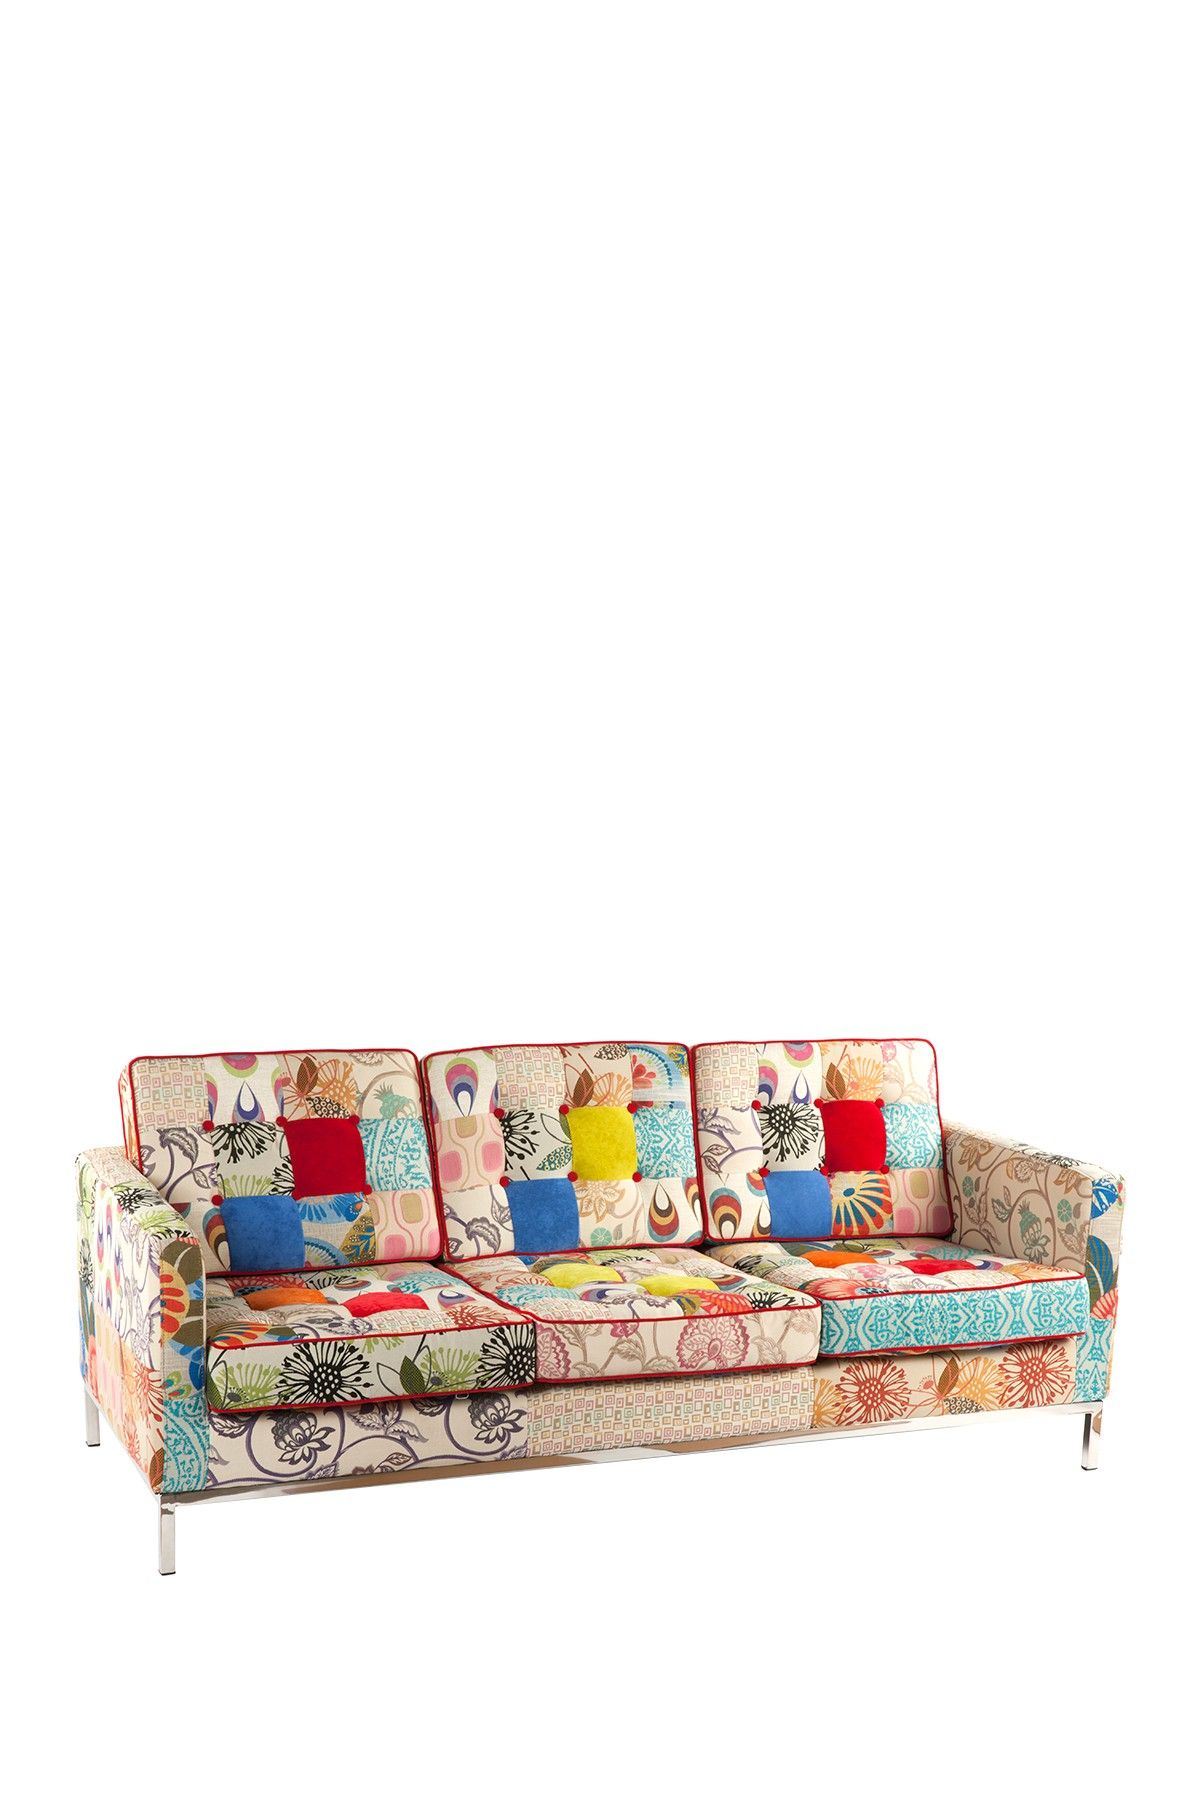 The Draper Patchwork Sofa from Control Brand Newest  : 9699fdfab8a8c93b0683d4d06b2ea7e2 from www.pinterest.com size 1200 x 1800 jpeg 230kB